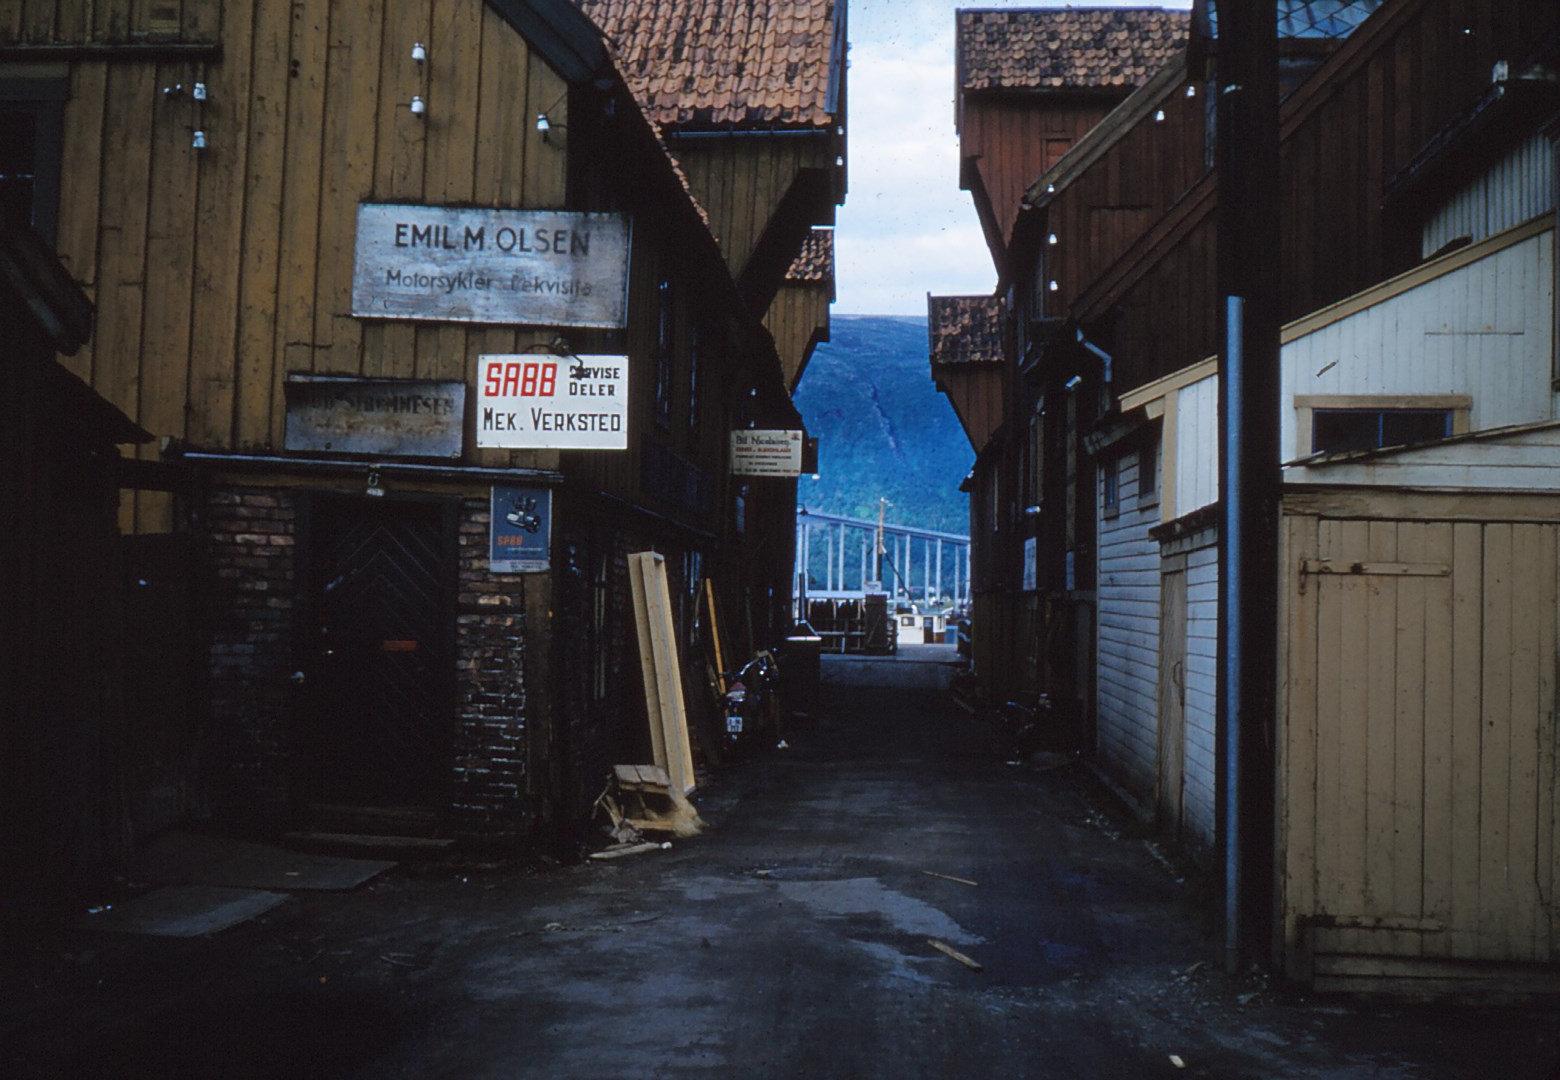 871 (20) Tromsø steeg A